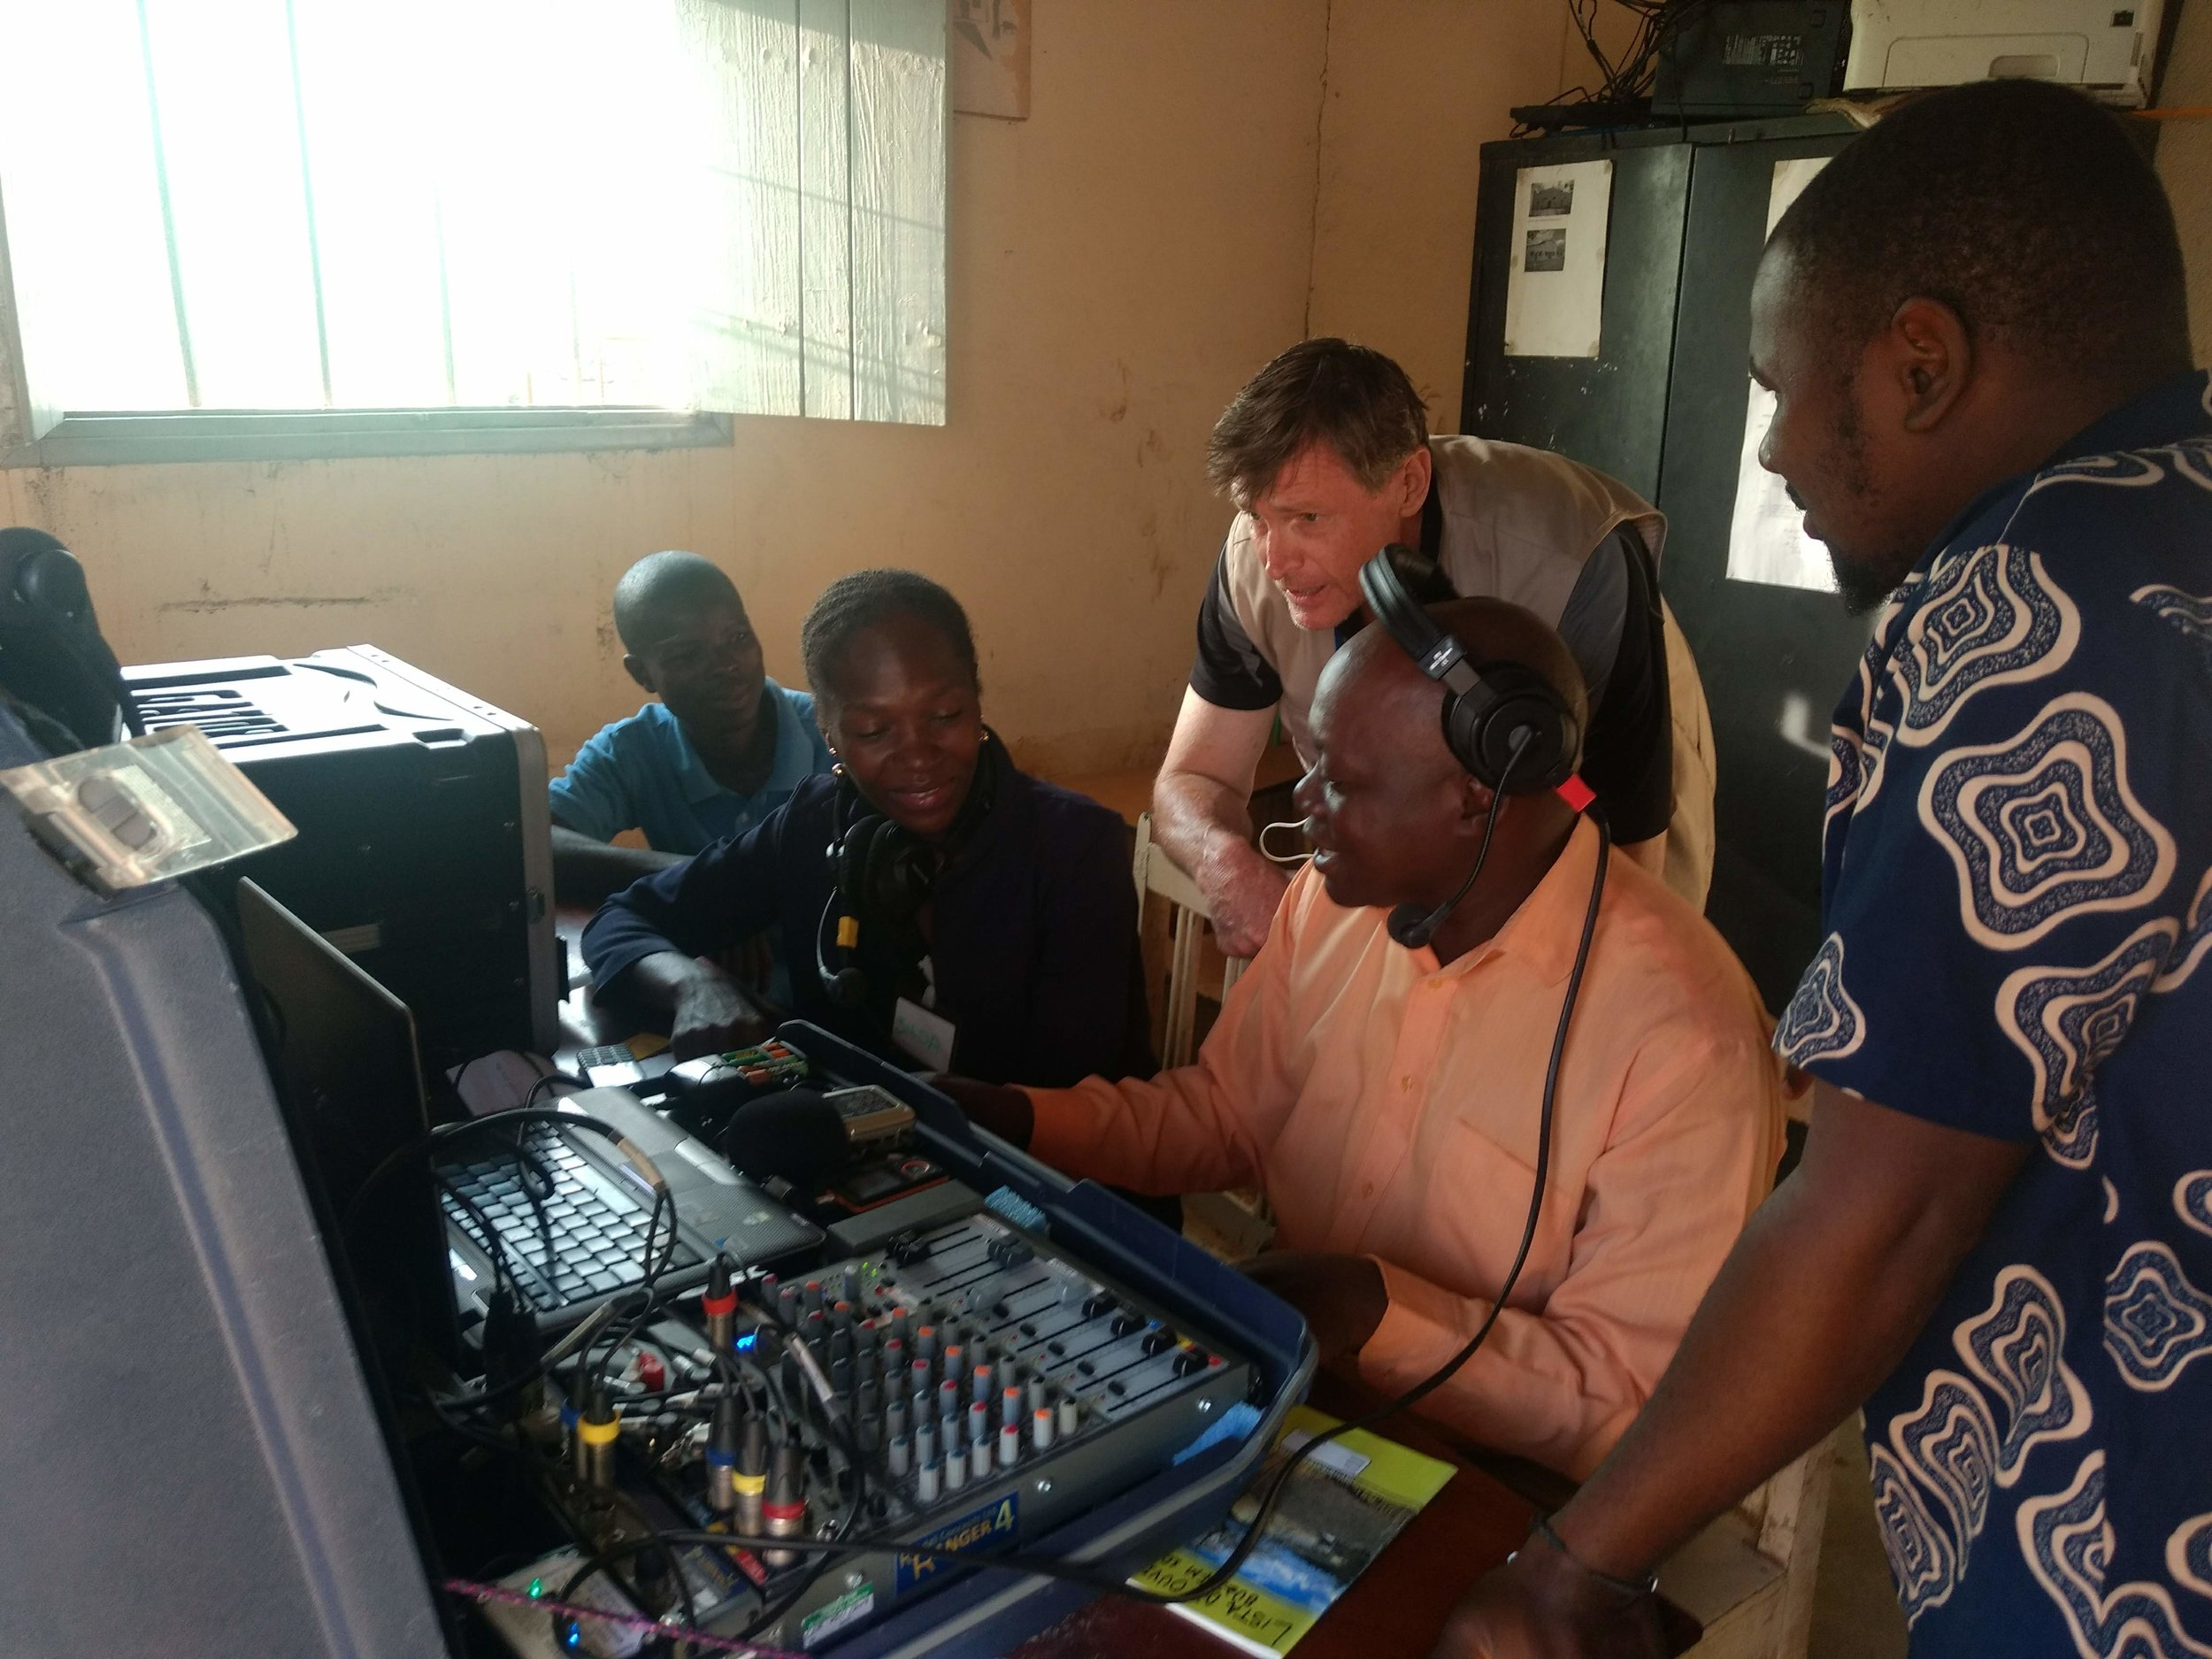 Buzi FM using FRR studio suticase equipment, March 2019. (Photo credit: HCR)